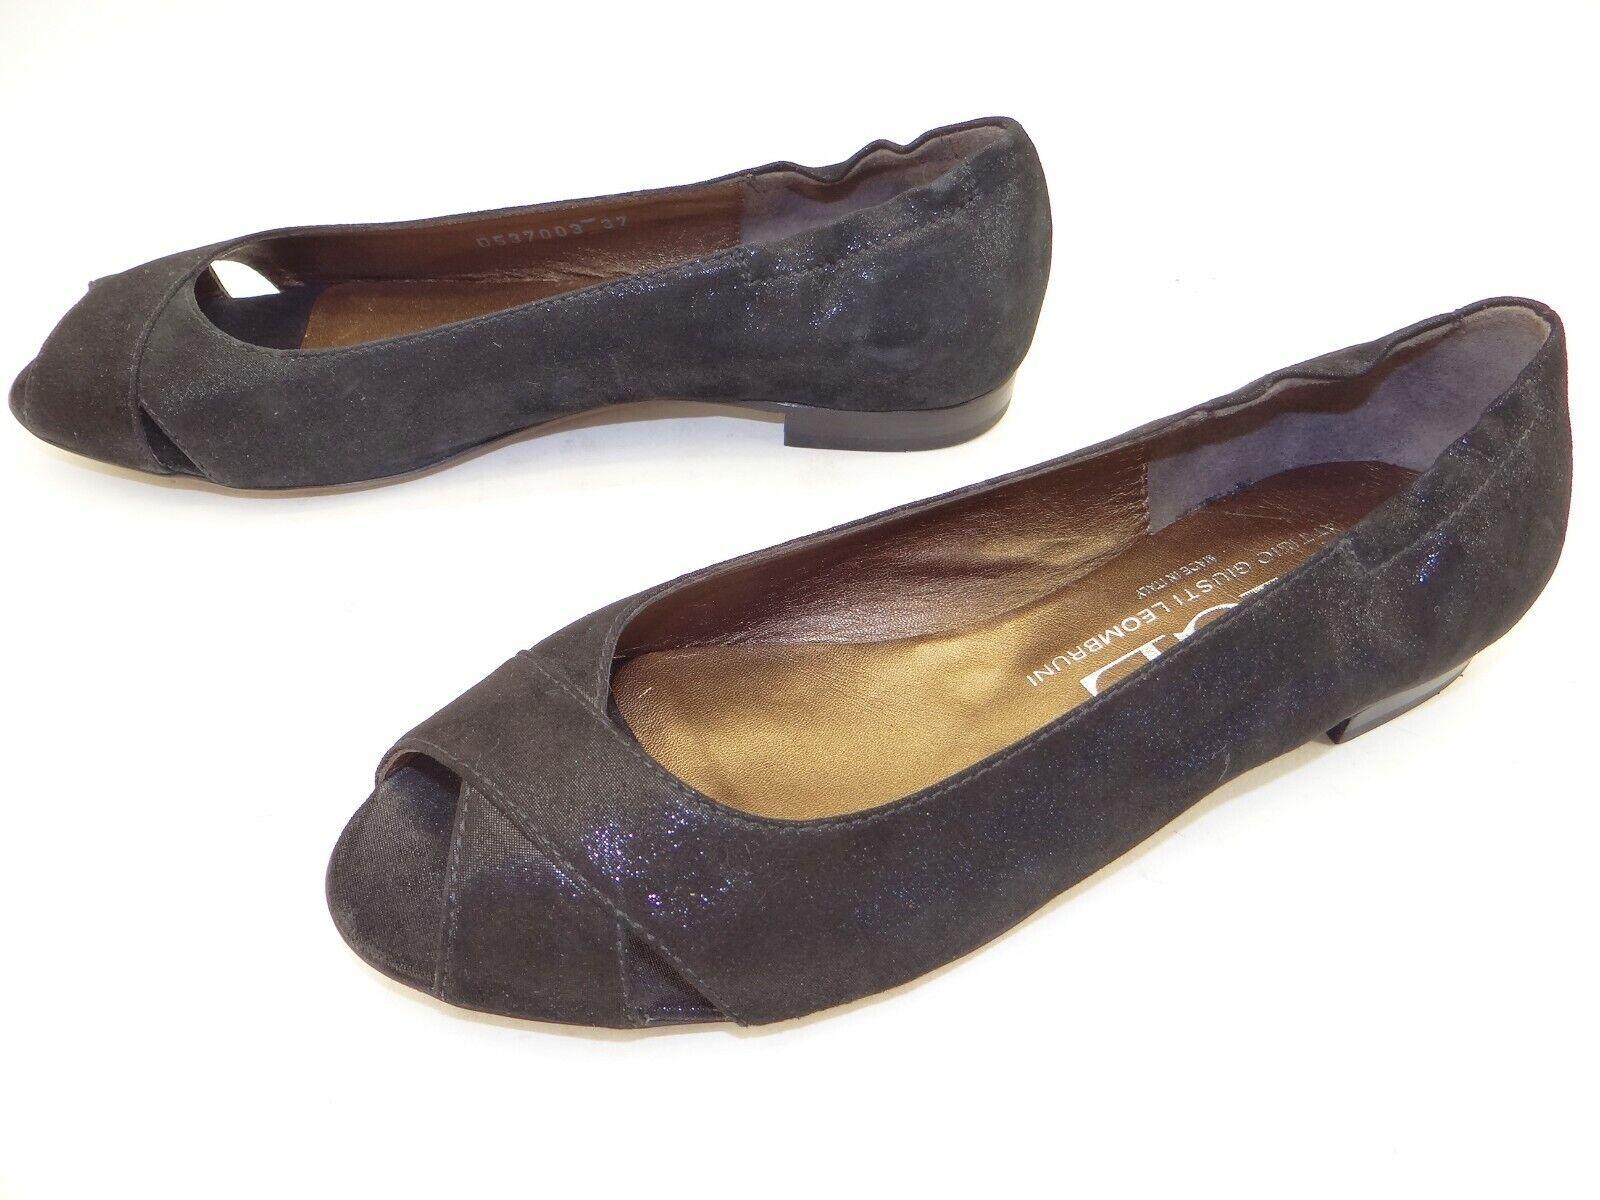 AGL Attilio Giusti Leomblaufi Damänner Sandalen Ballerinas Schuhe Slipper Gr. 37 Neu